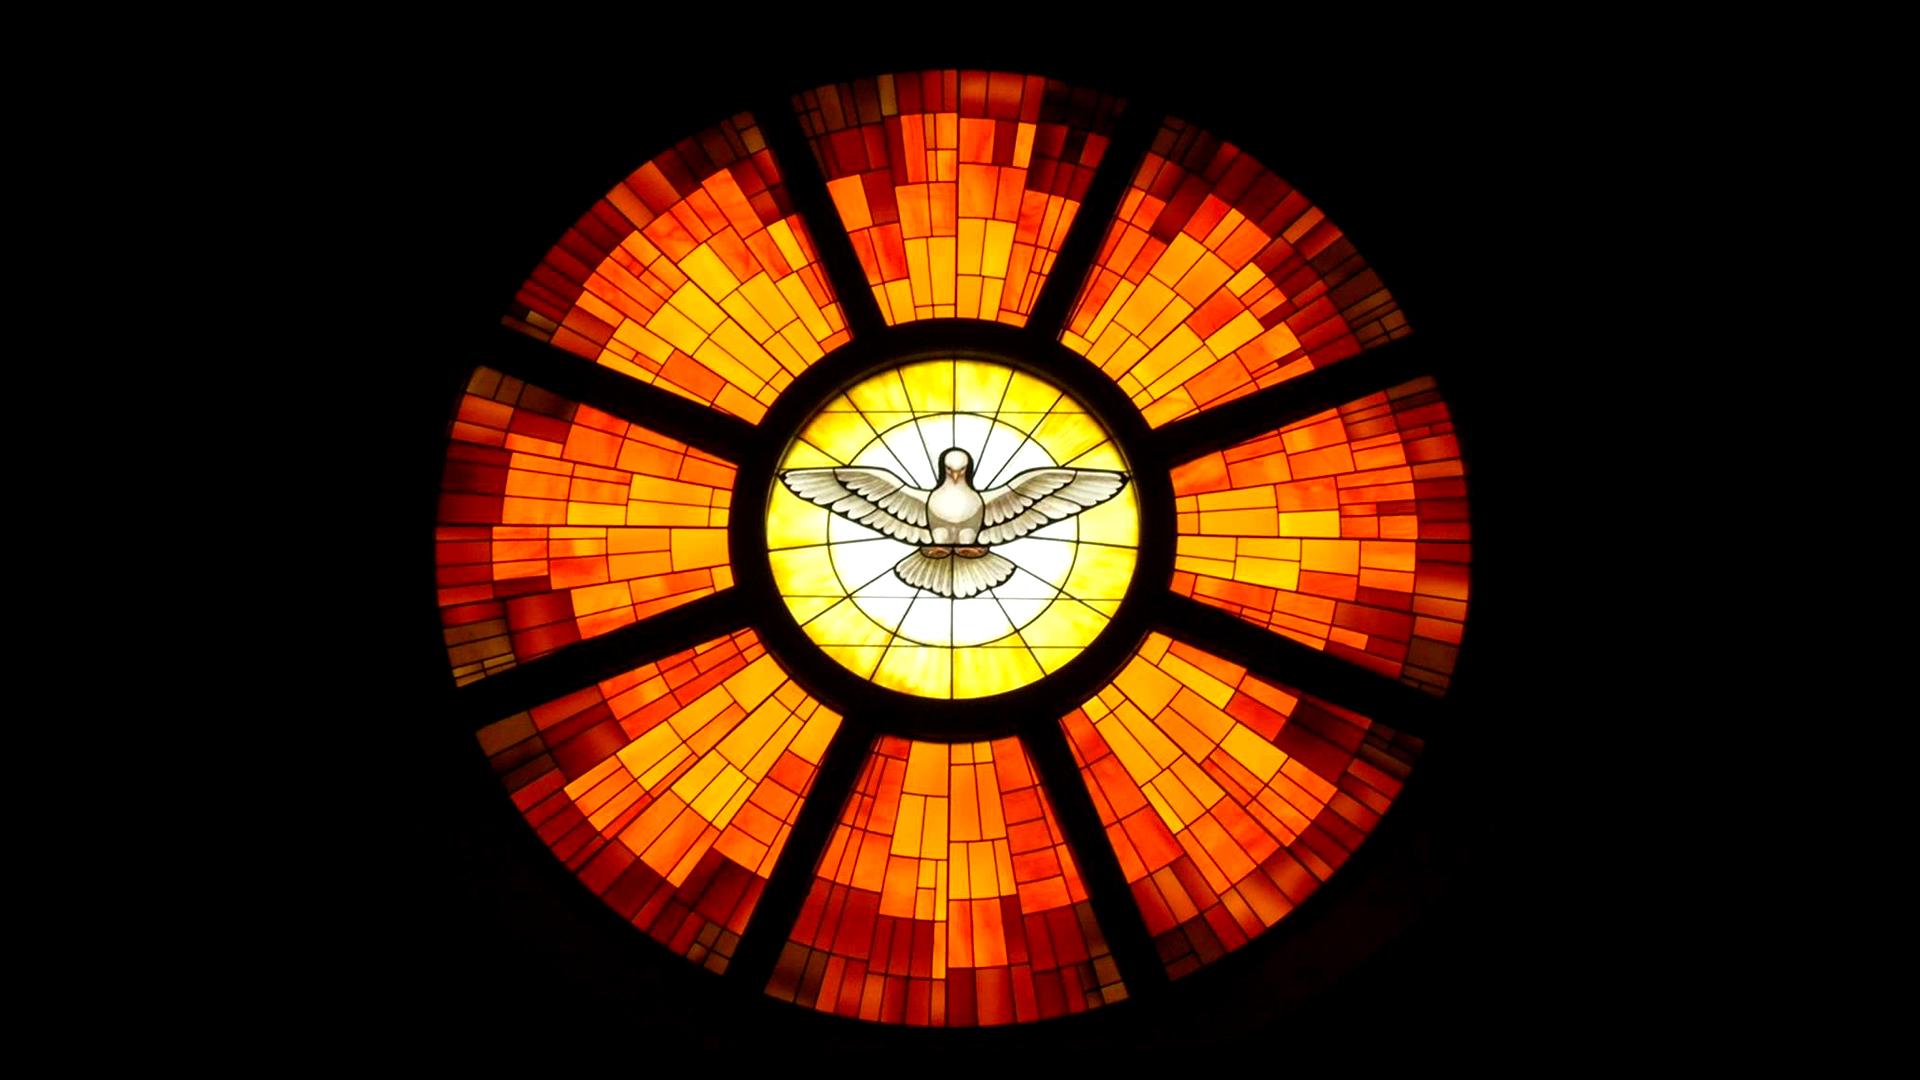 Holy Spirit Wallpaper 1920x1080 By Van Golliaz On Deviantart